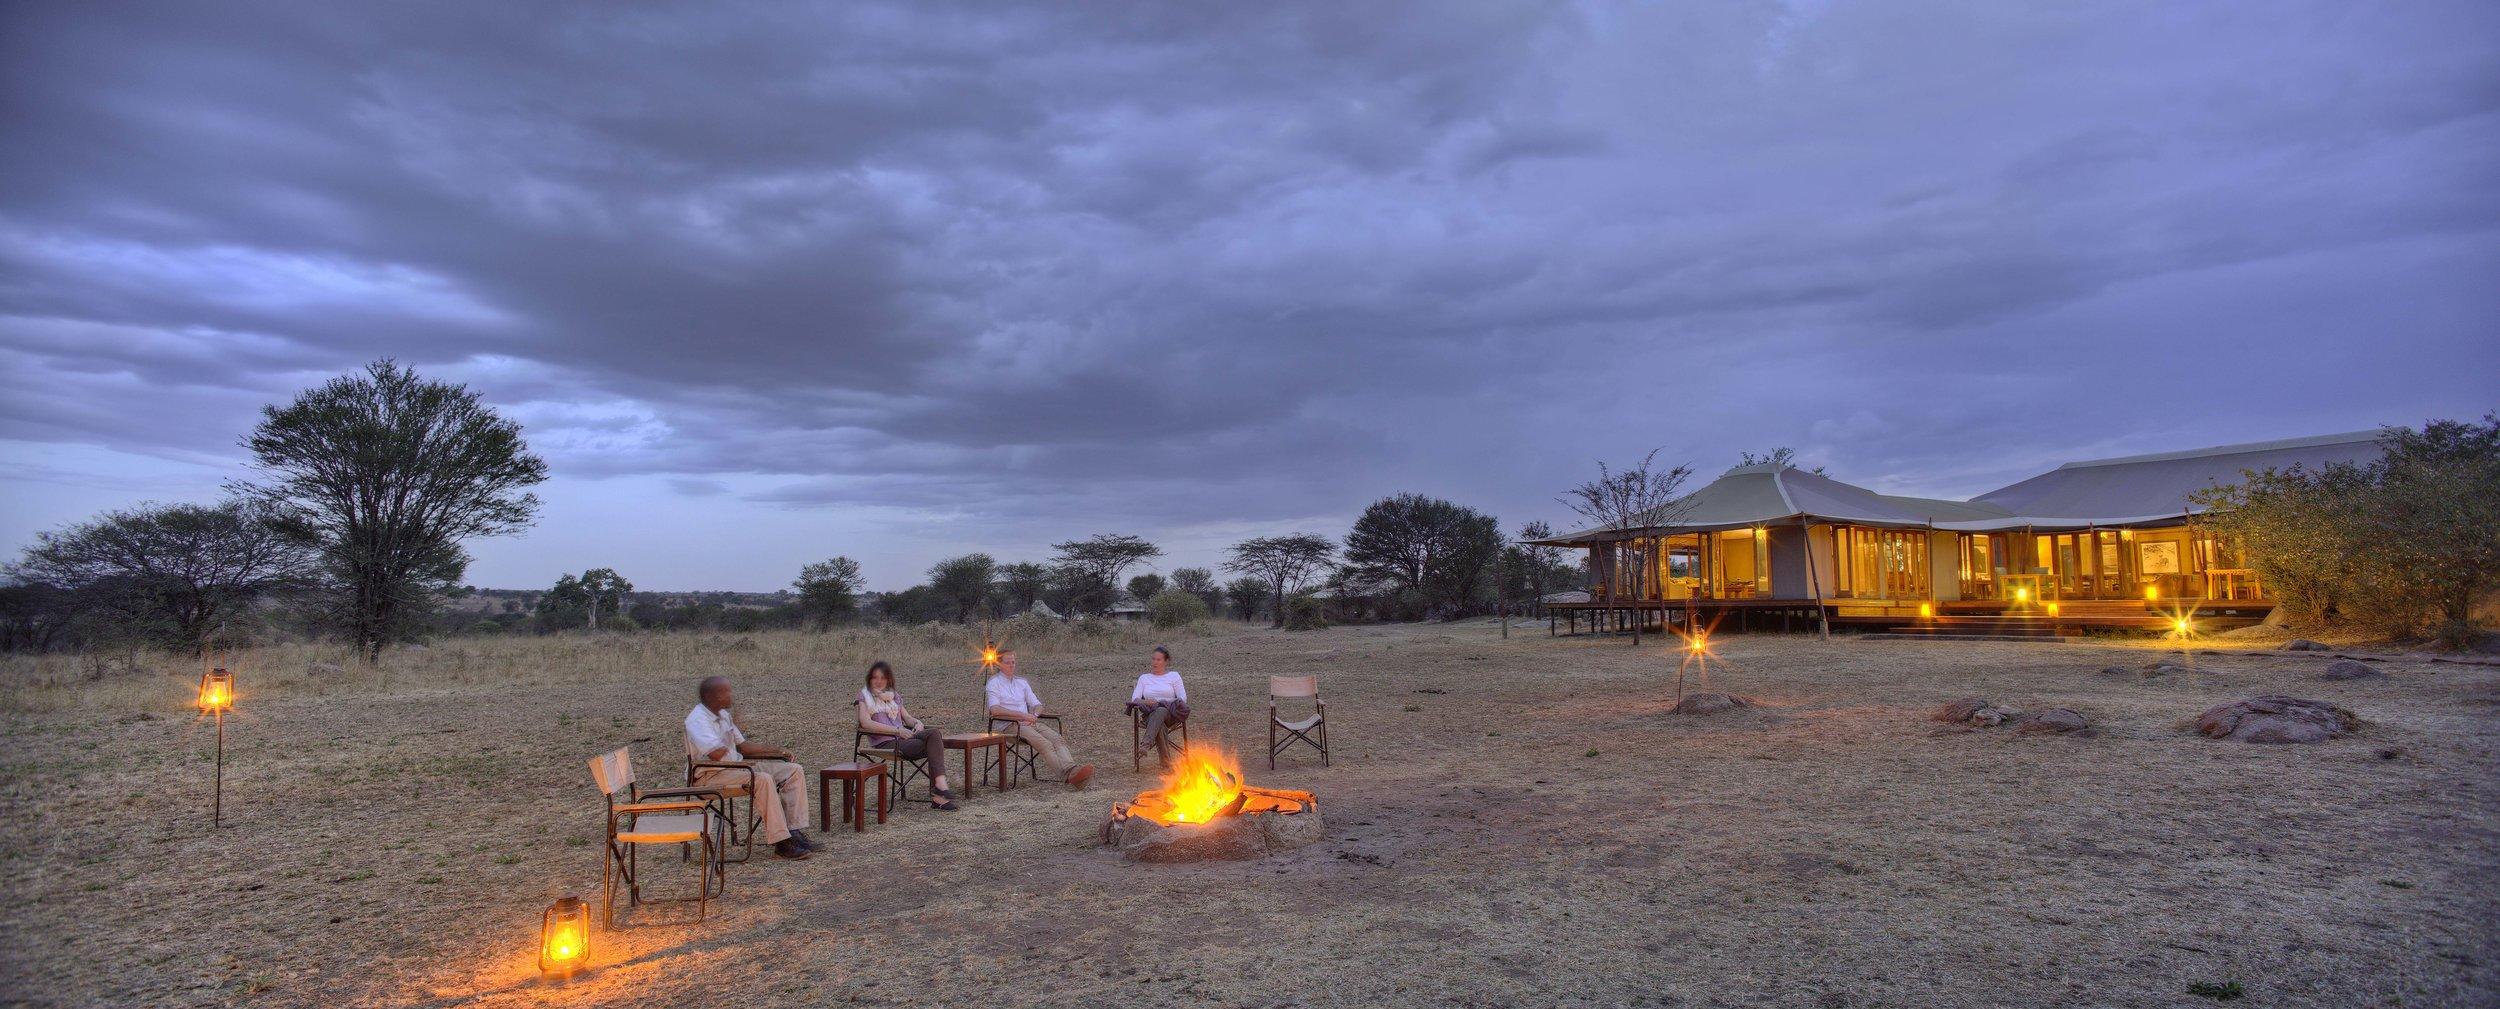 Sayari-drinks-by-the-campfire.jpg